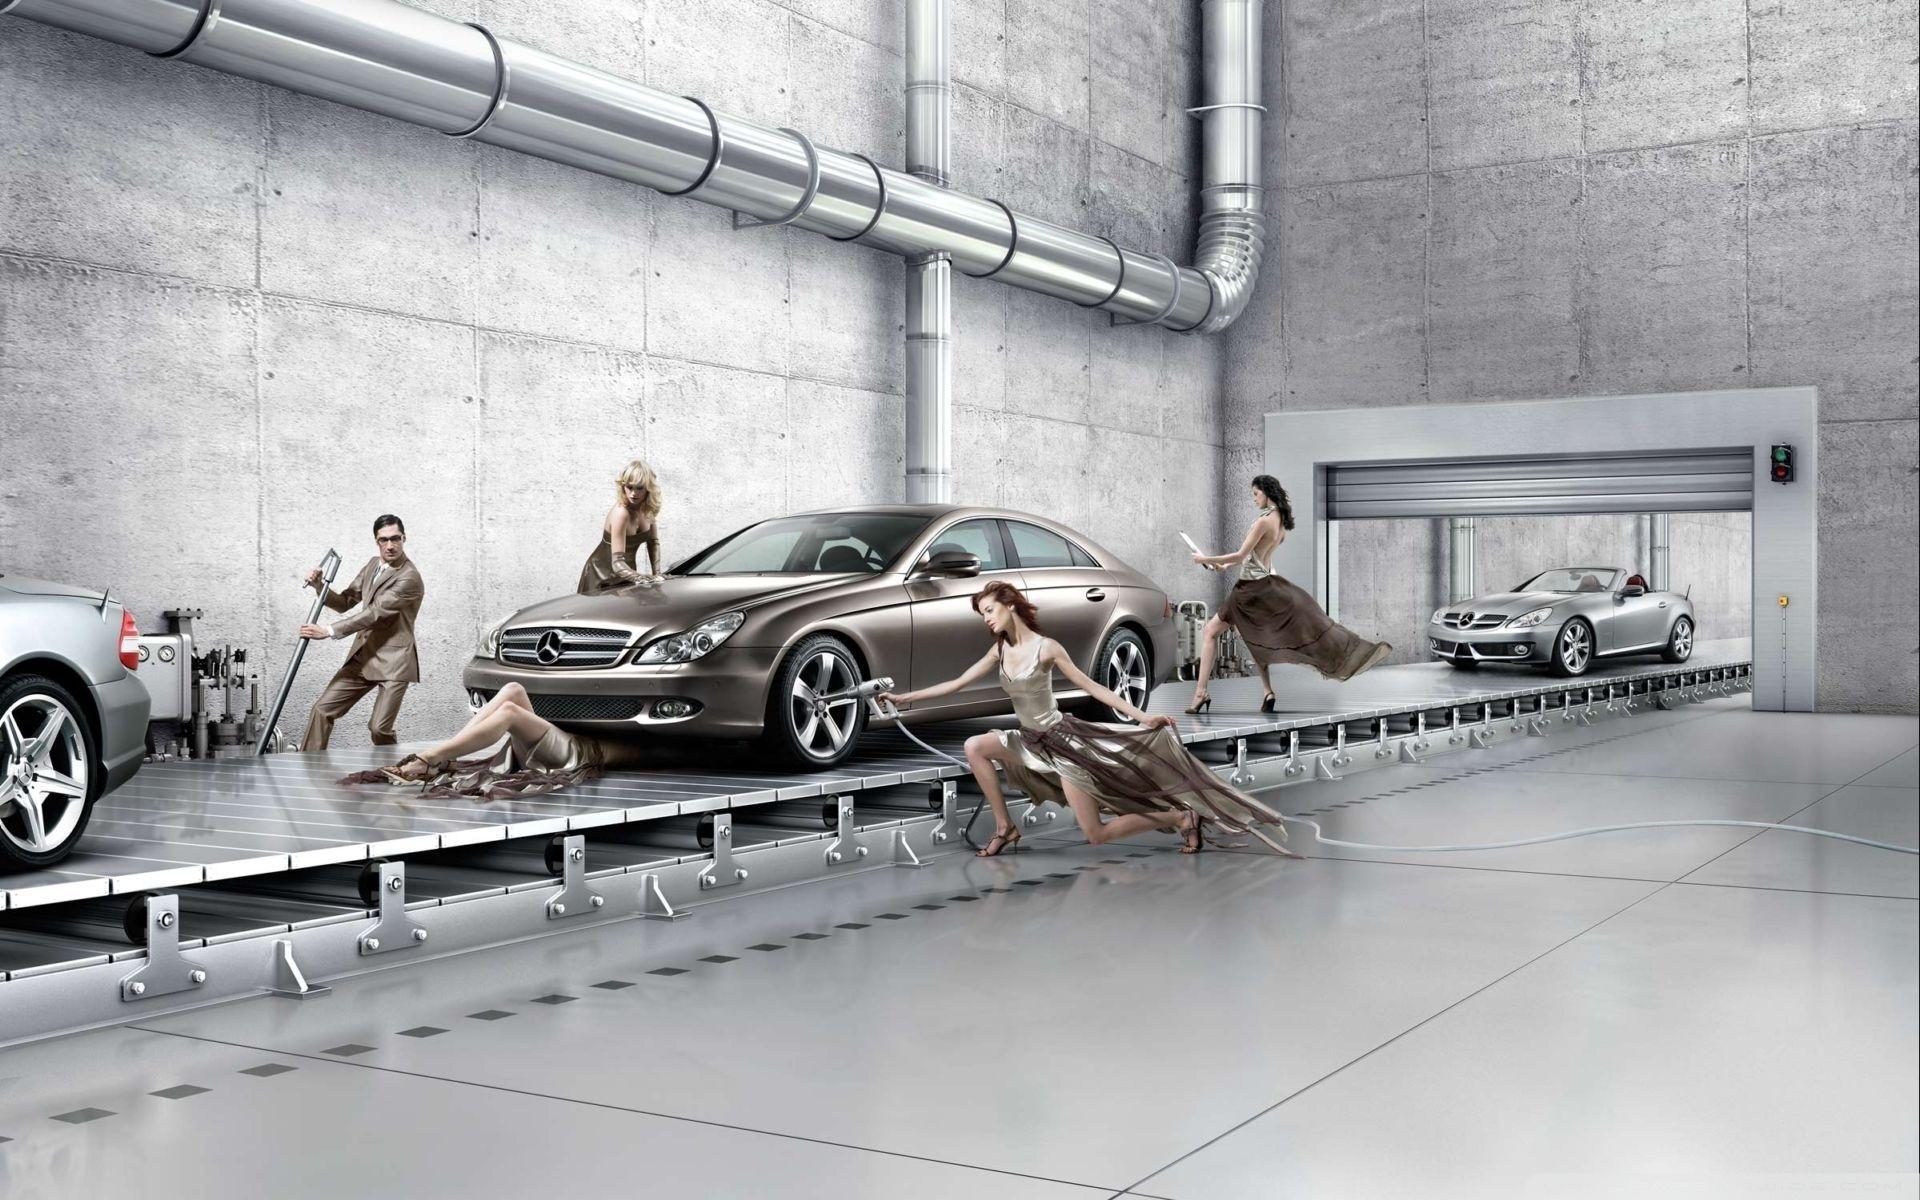 Car Mobile Wallpapers 240x320 Mercedes Benz Assembly Line 4k Hd Desktop Wallpaper For 4k